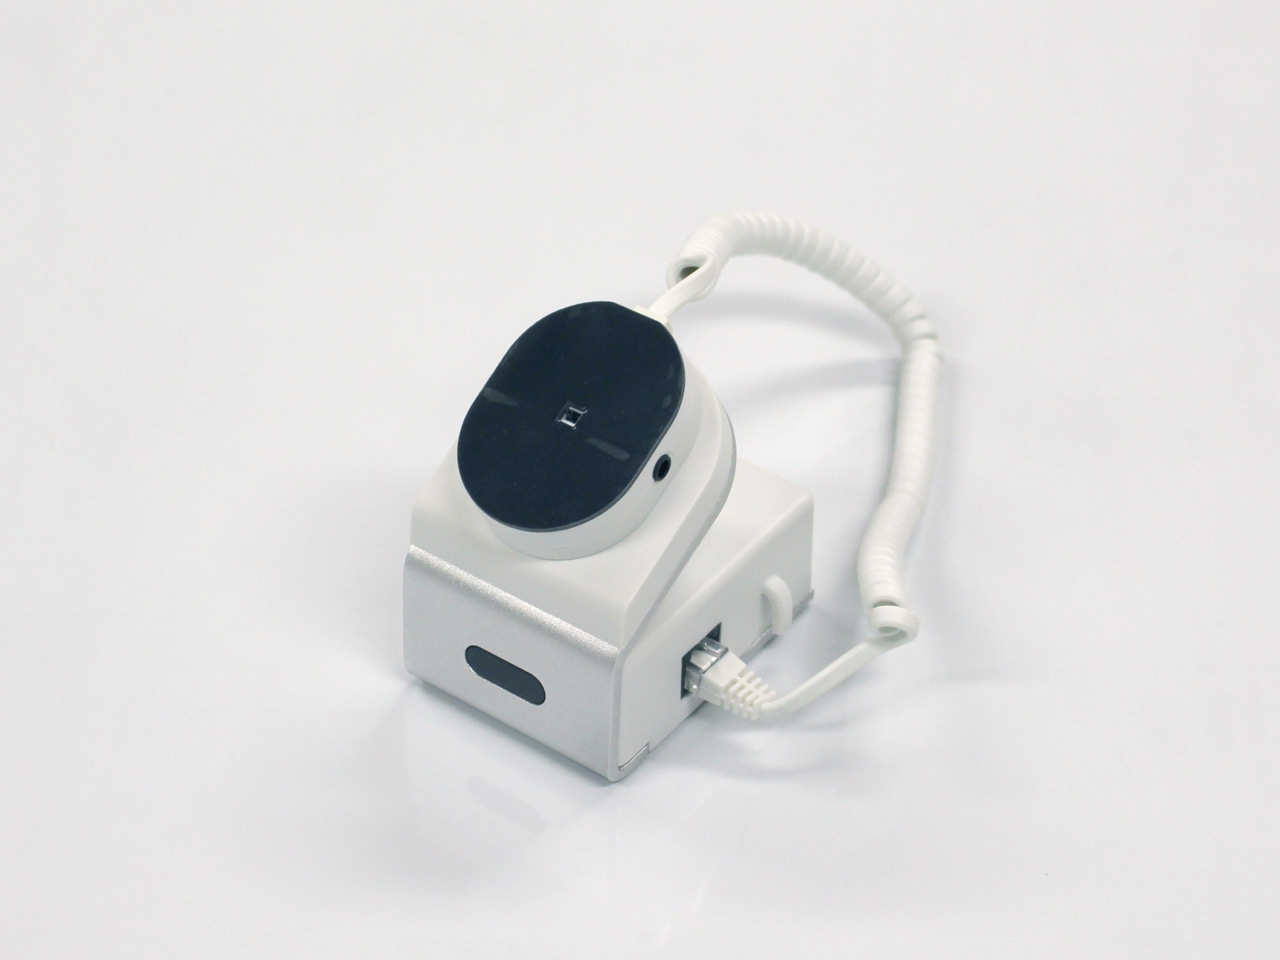 Ontime Sp2108 - New Electronics Anti-Theft Alarm Magnet Tablet Holder